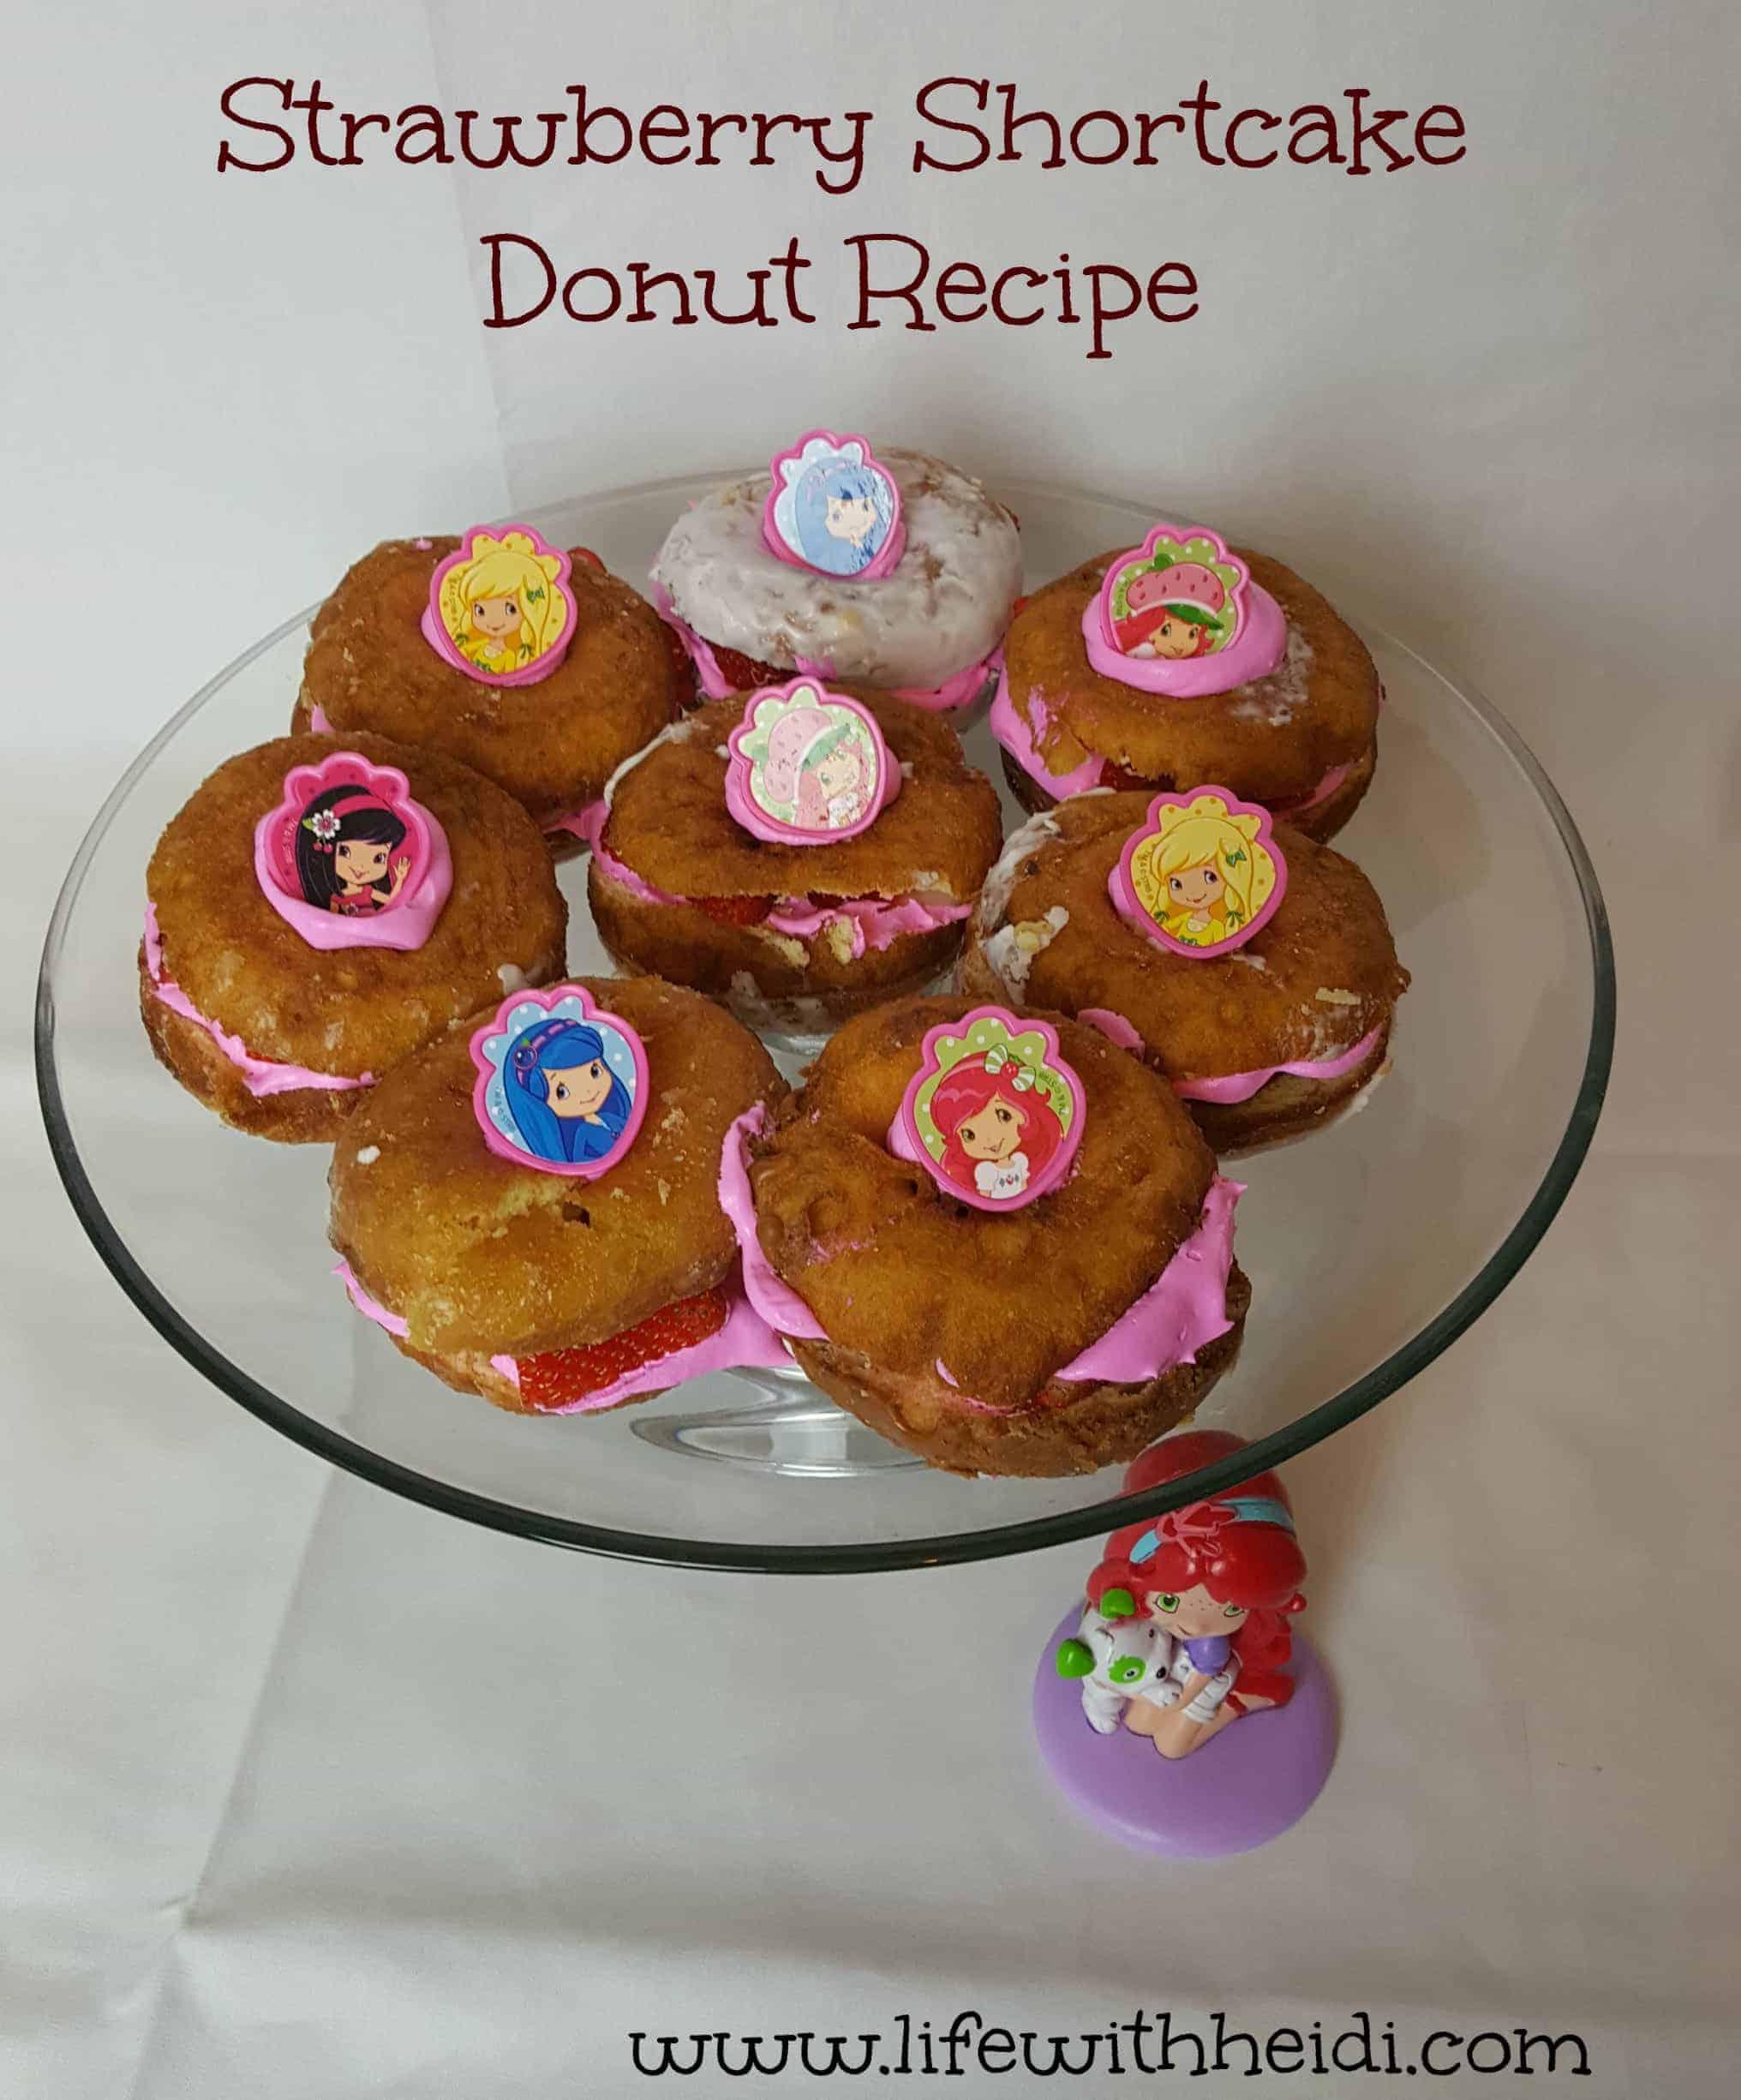 Shortcake Donut Recipe